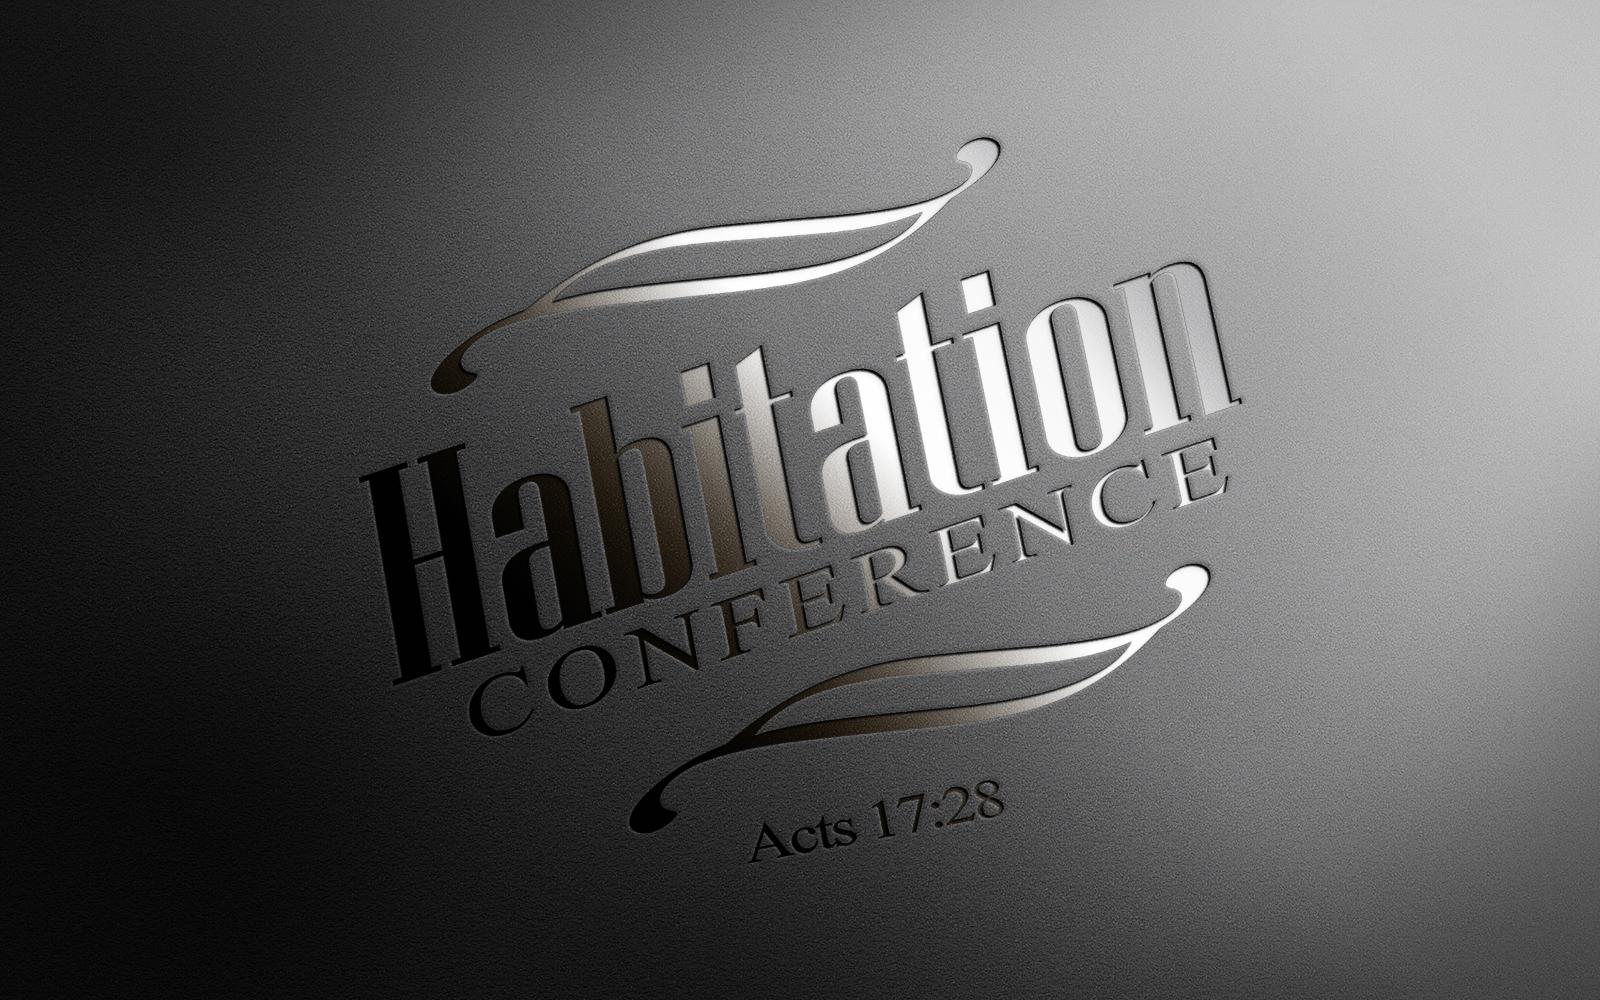 habitation conference logo_ivey media group.jpg